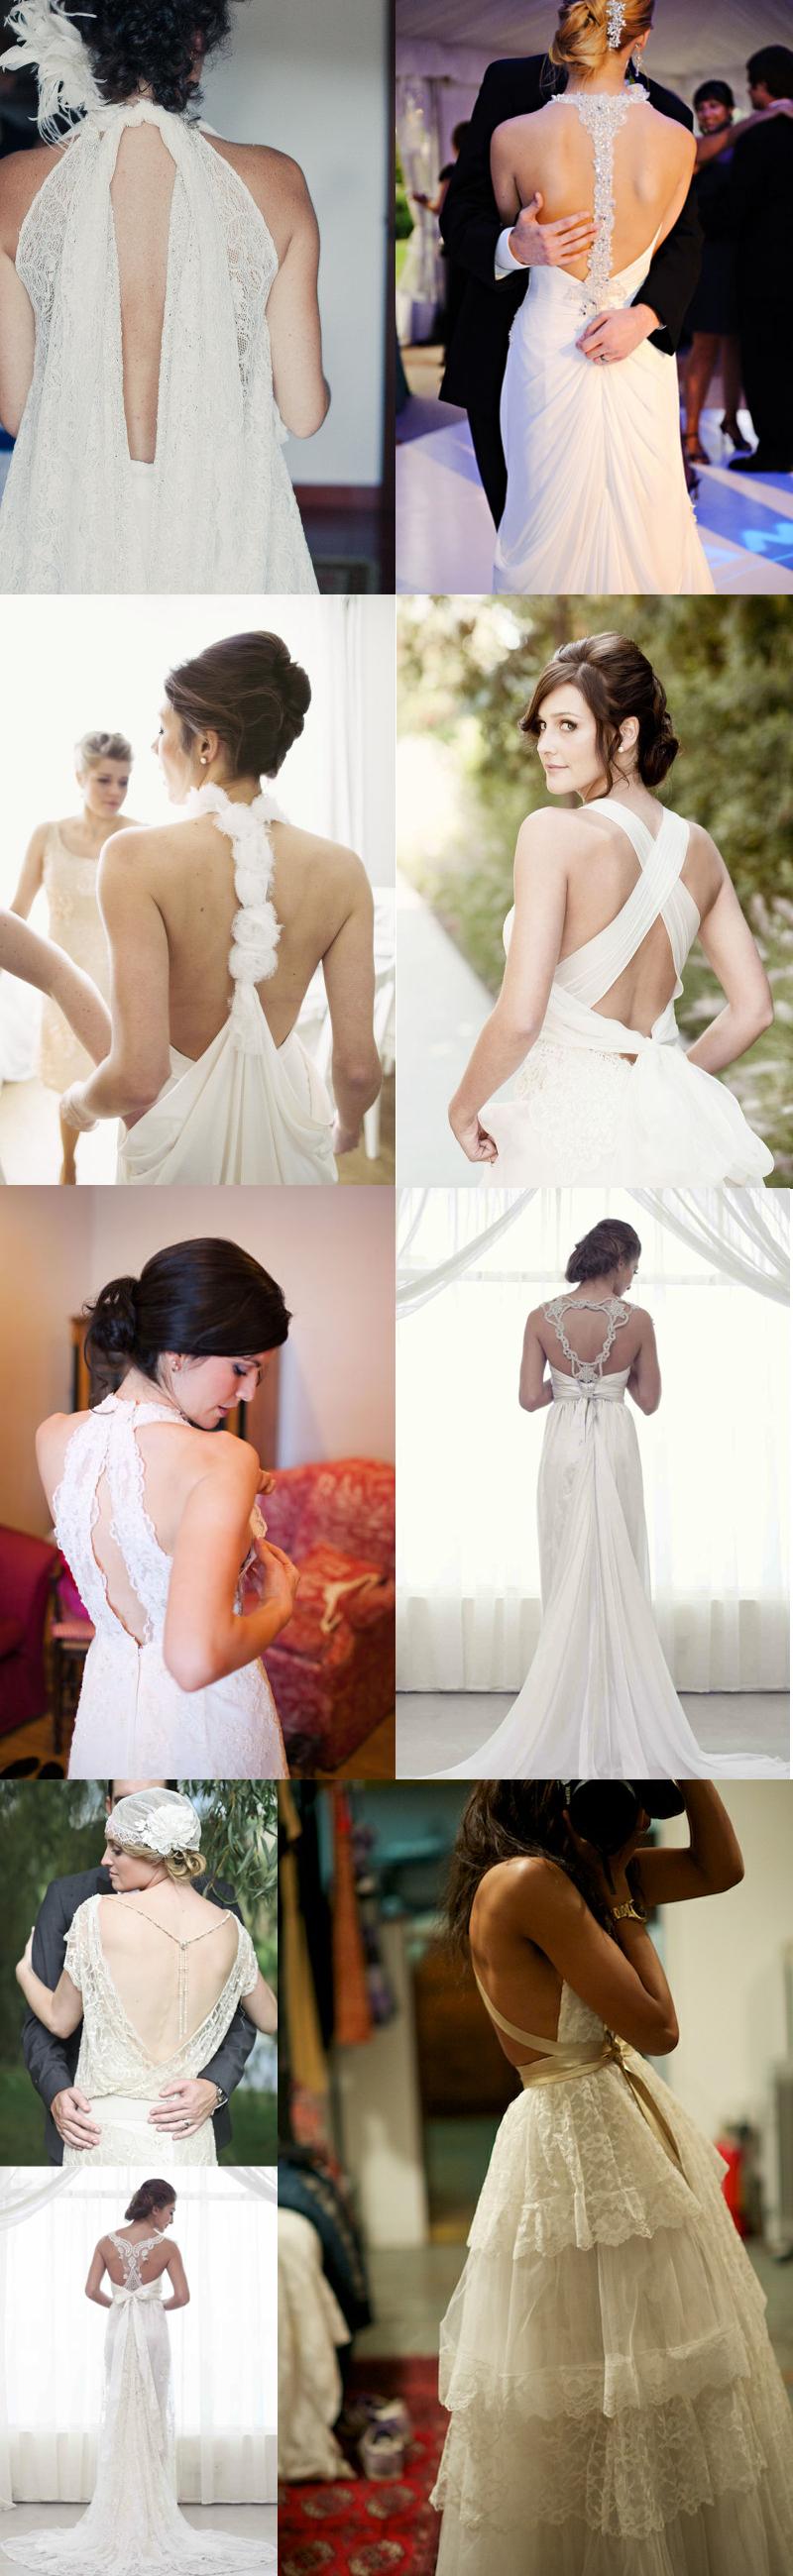 Wedding Trends: The Backless Wedding Dress